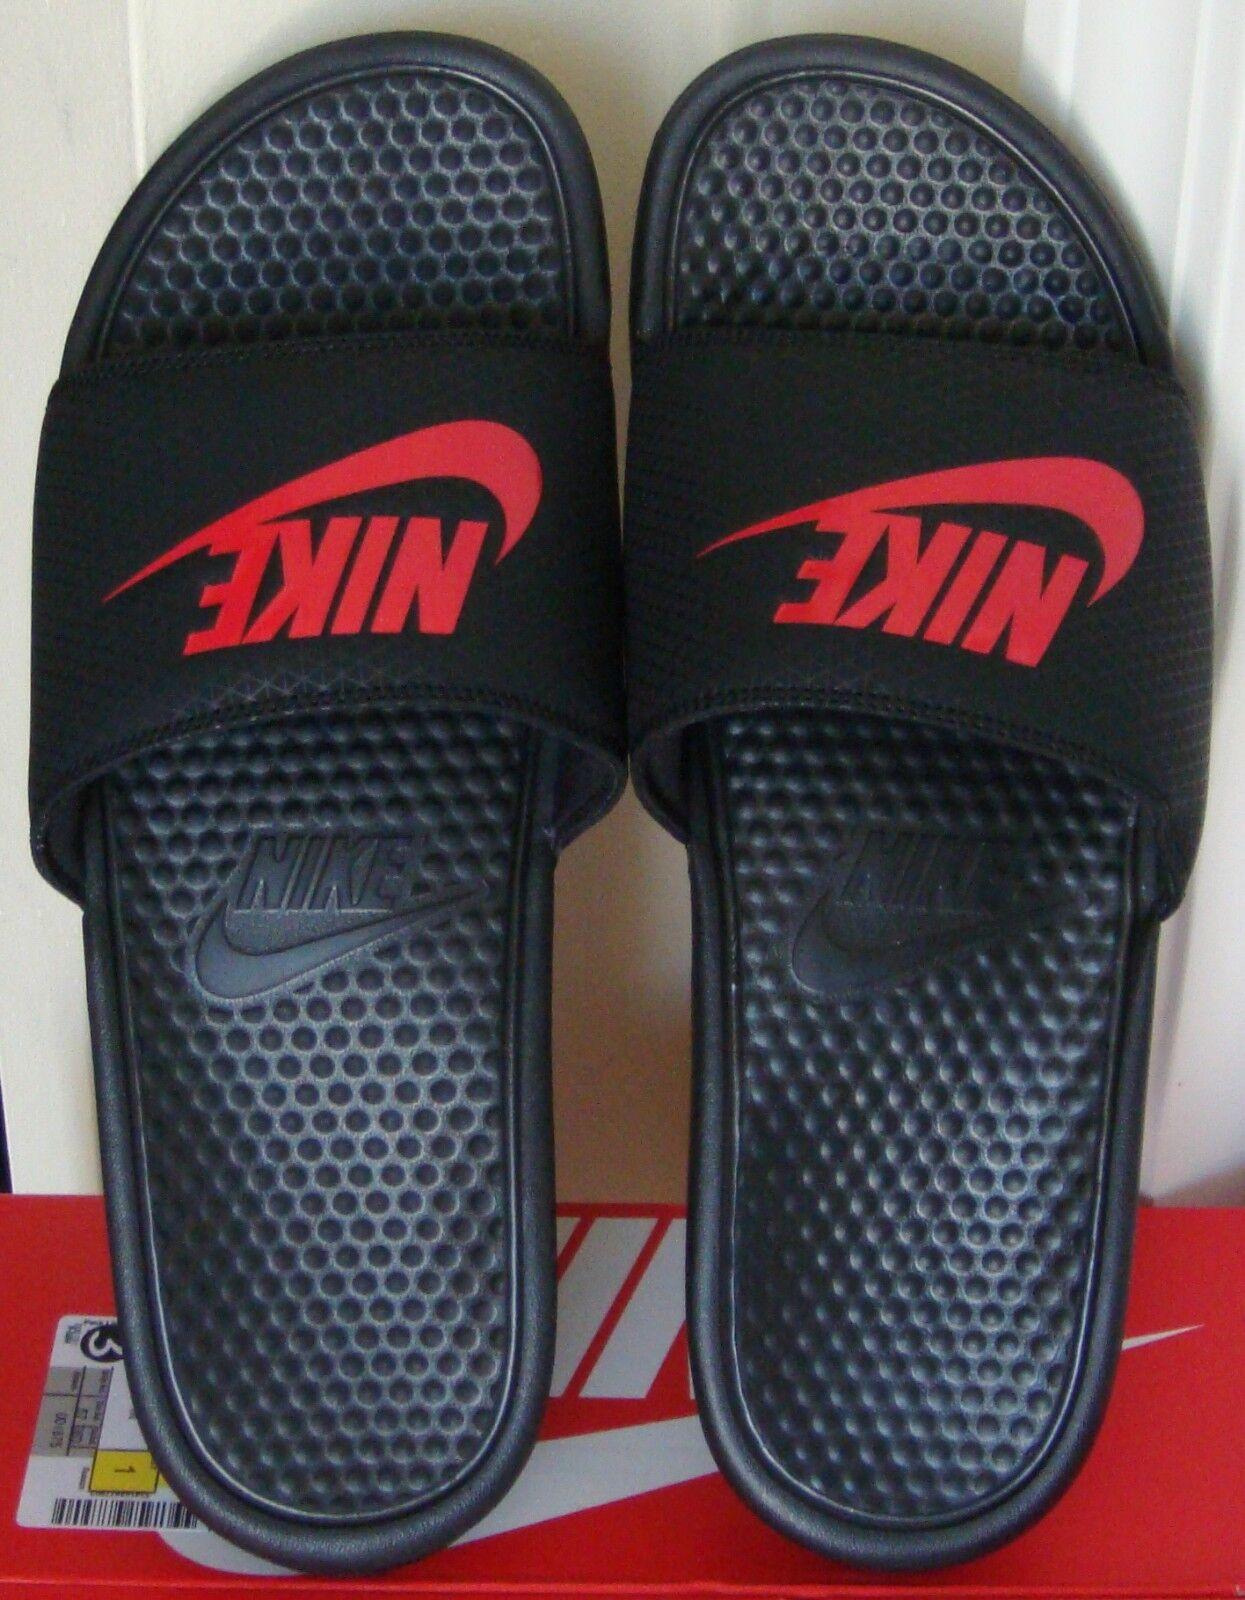 Gli uomini sono nike benassi jdi jdi jdi slide sandali scarpe 343880 060 - sz.7 - 18 | Cheap  7e19b9